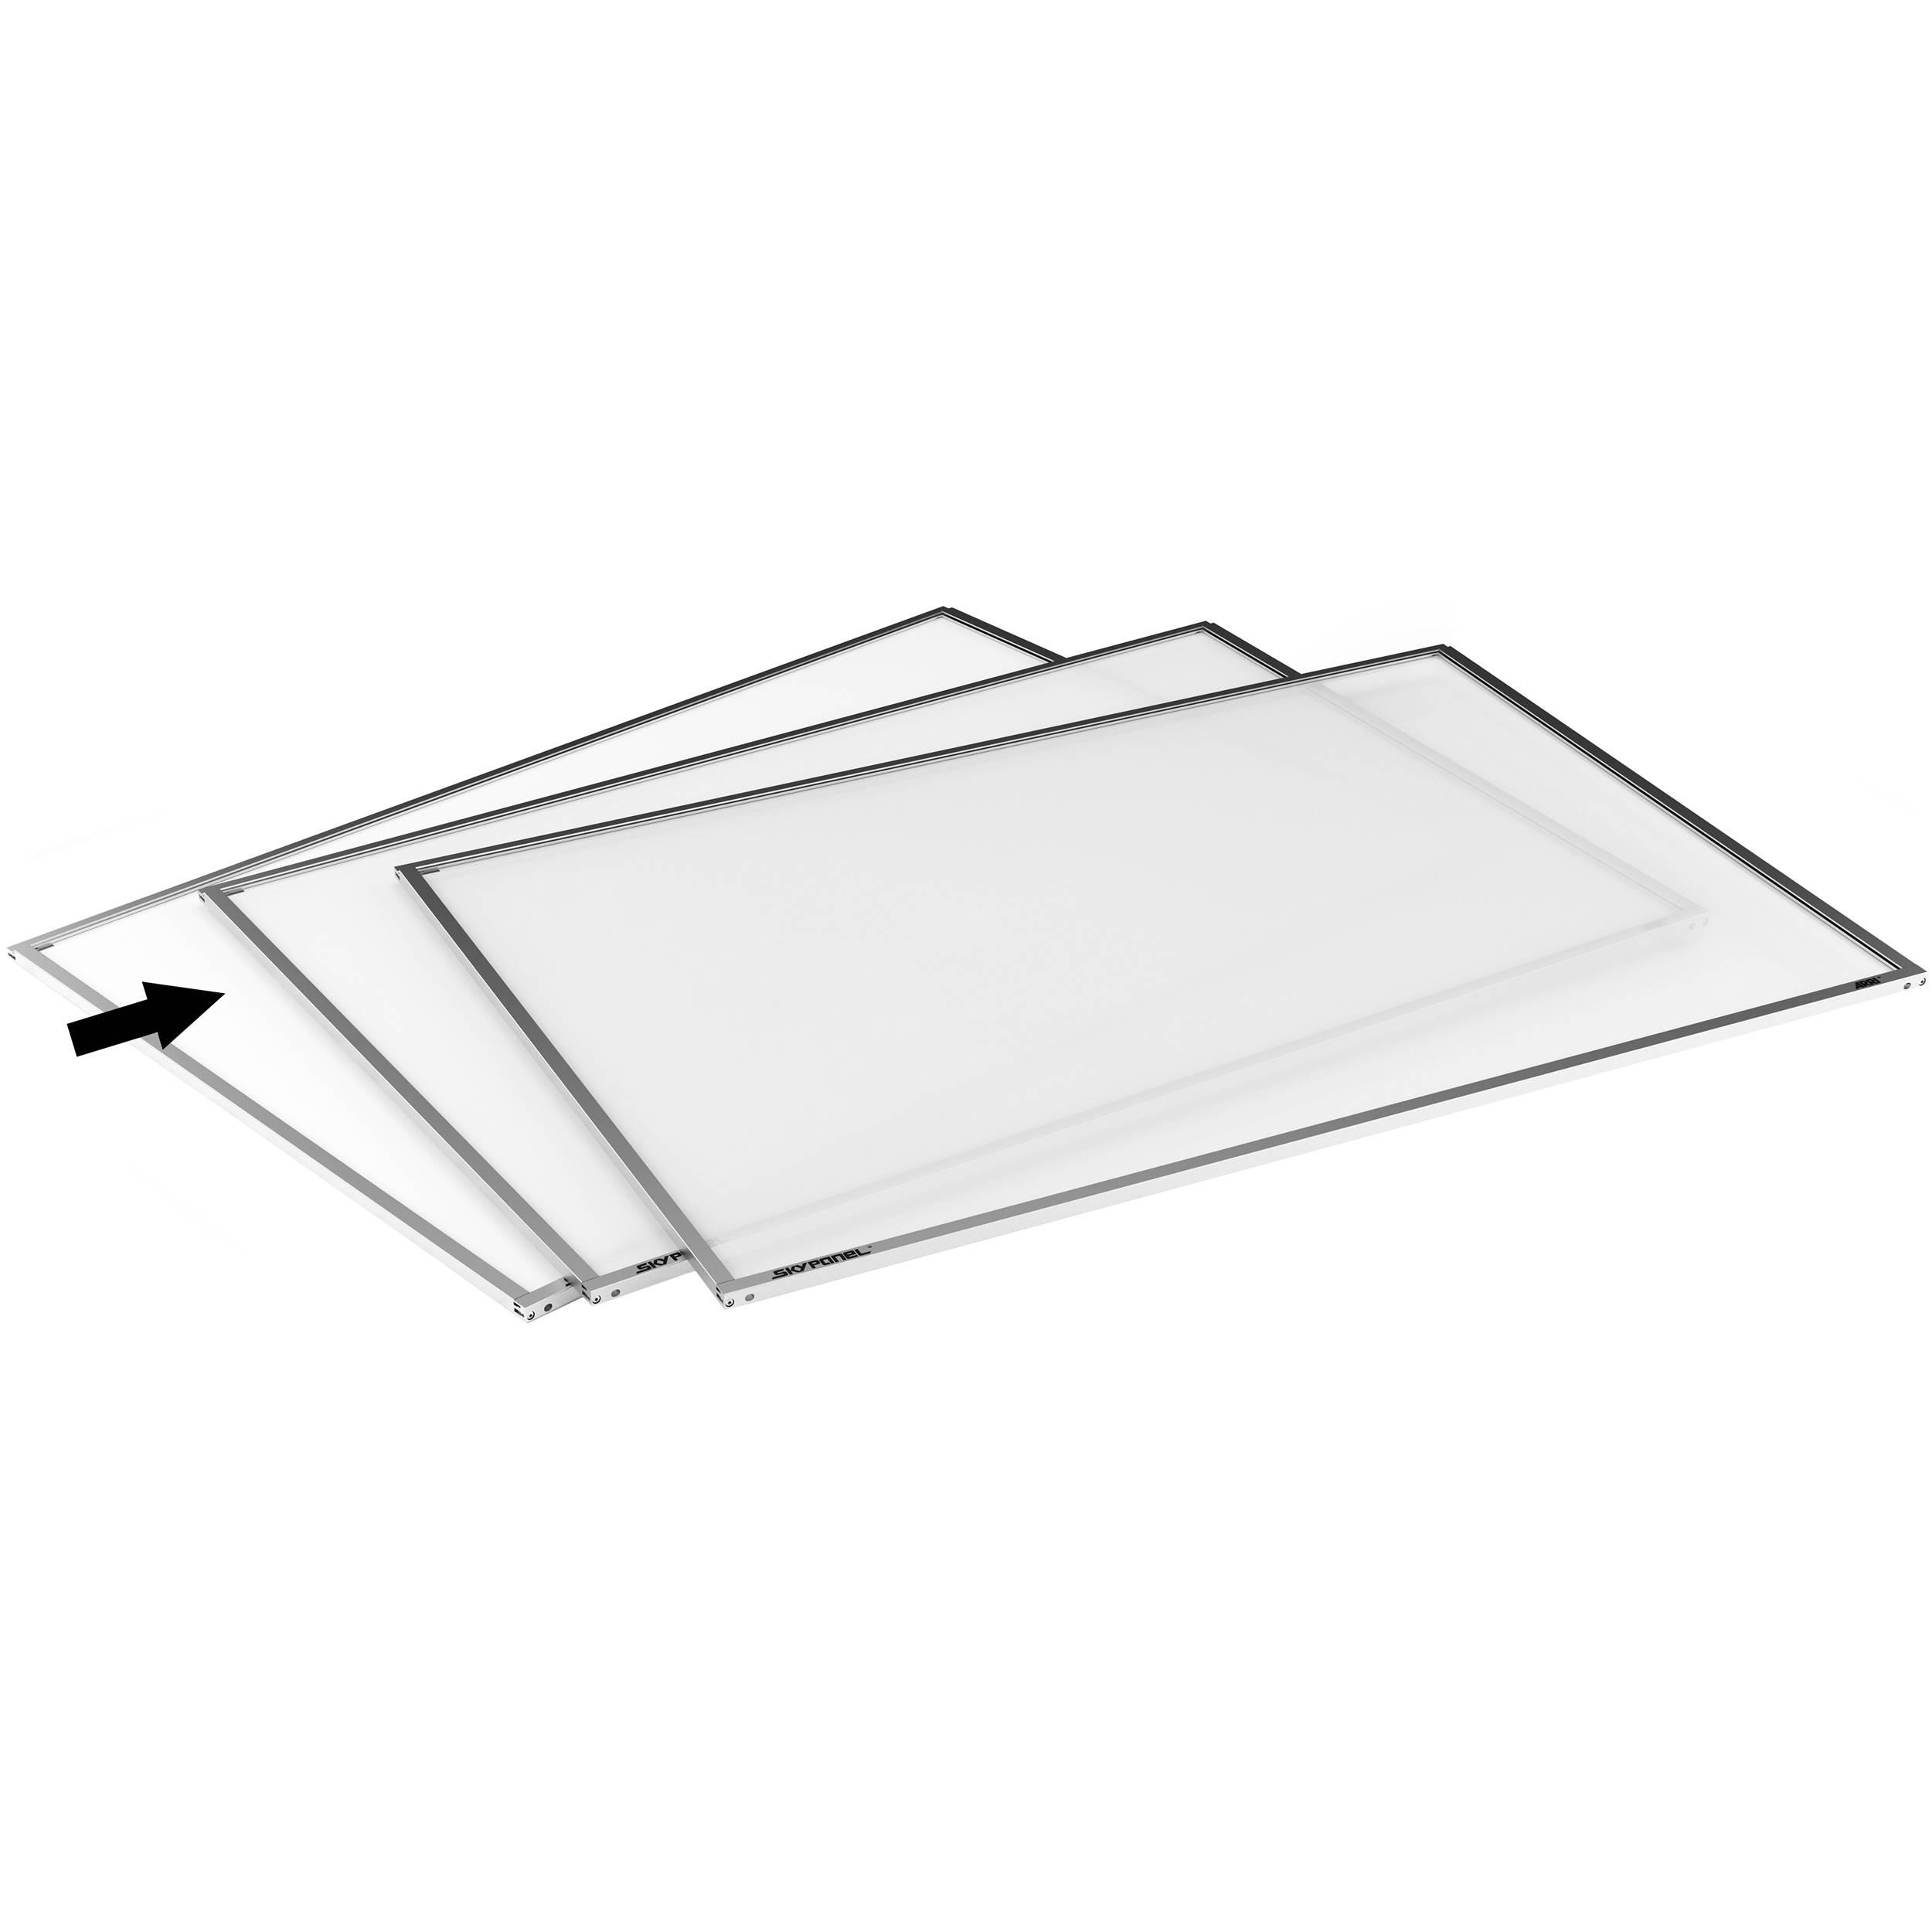 ARRI Lite Diffusion Panel for SkyPanel S360-C LED Light